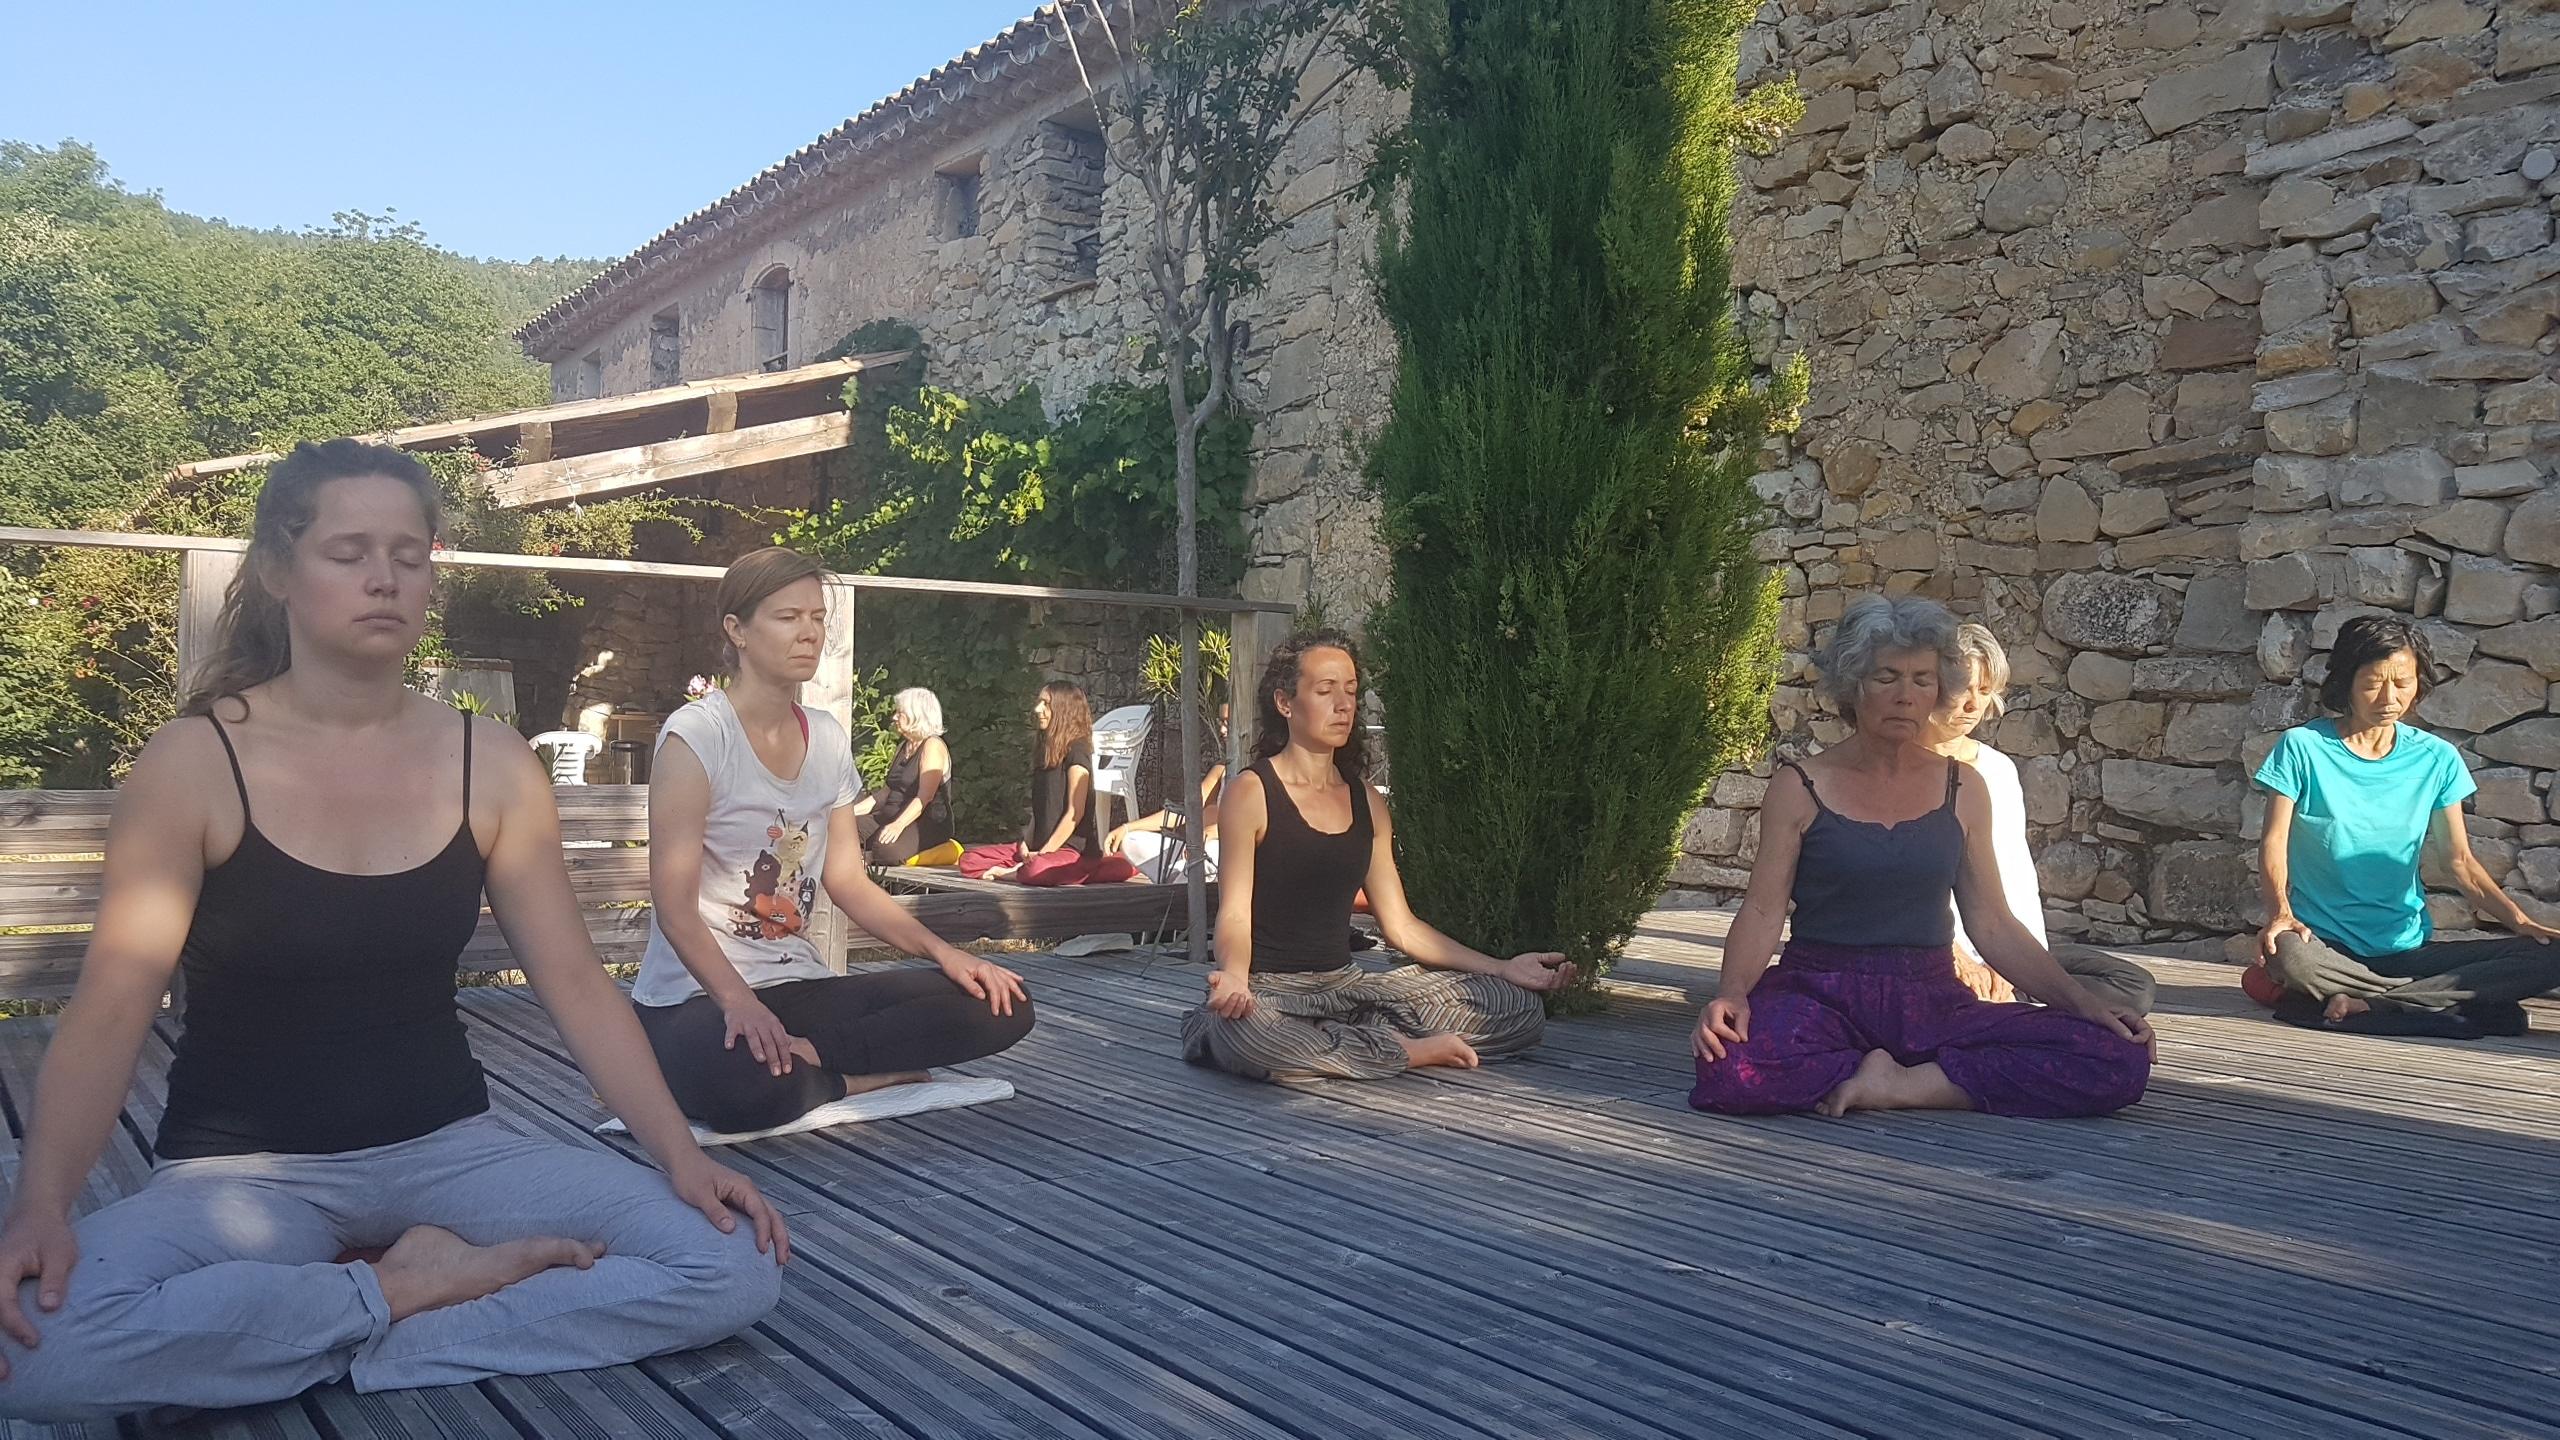 Retraite yoga juillet à Anakhyashram, ashram de yoga en Provence